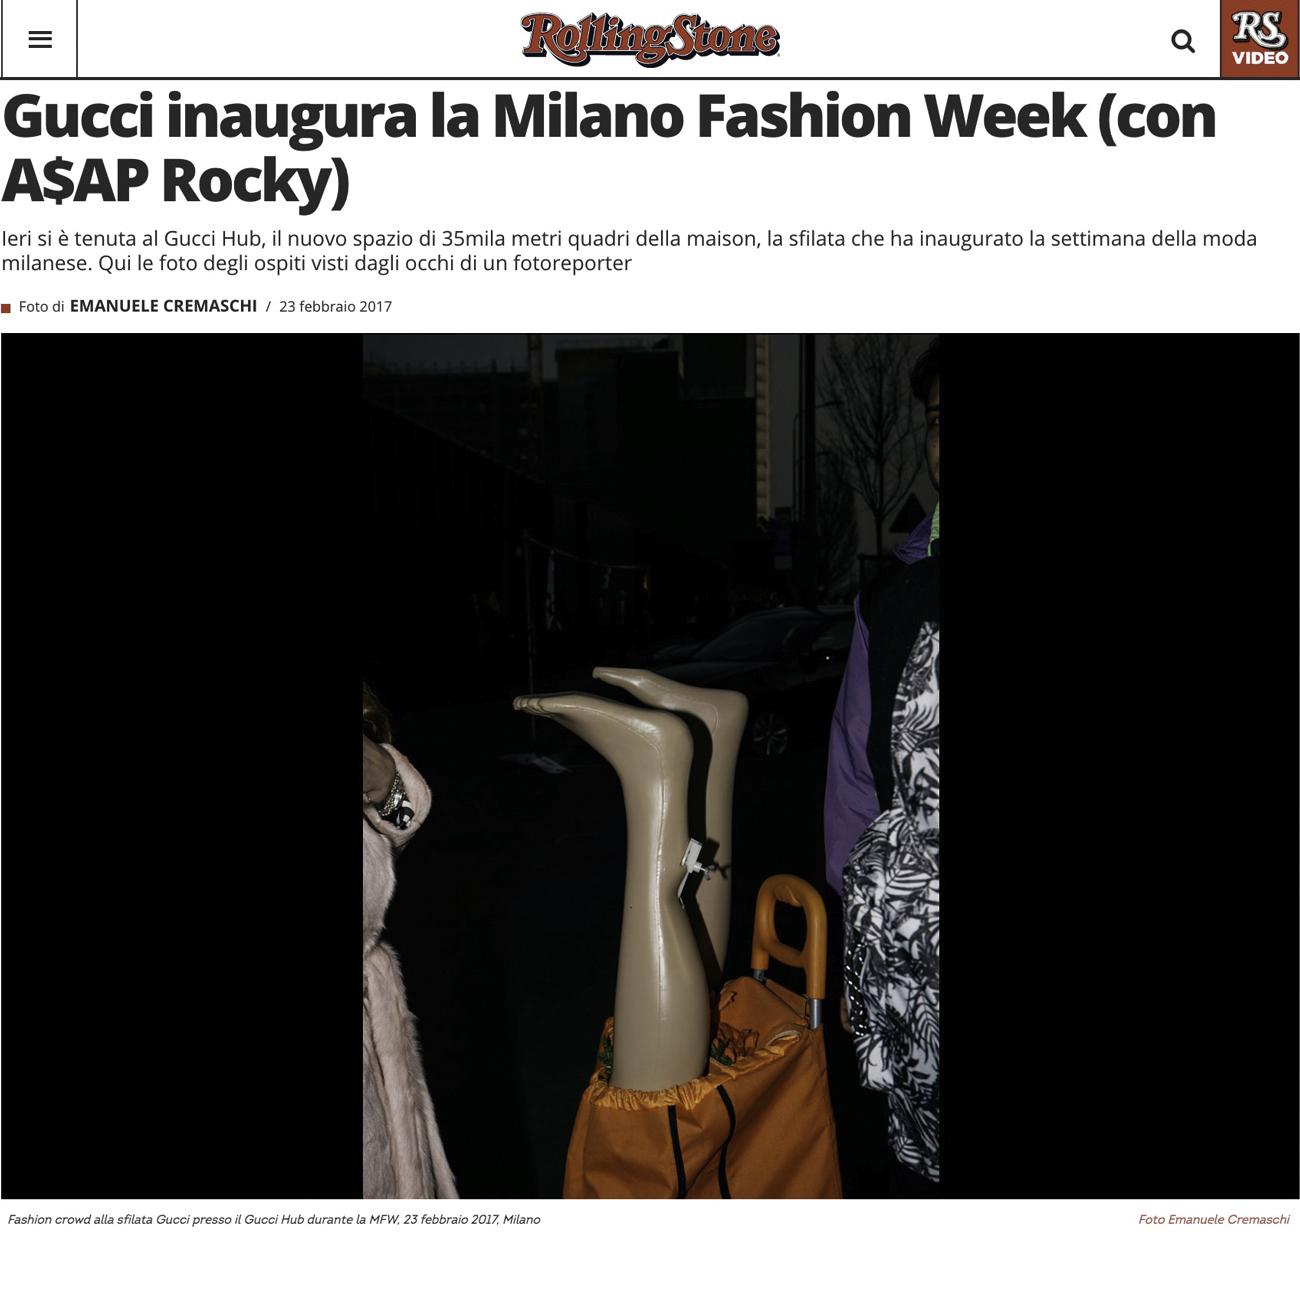 rolling stone fashion dummy